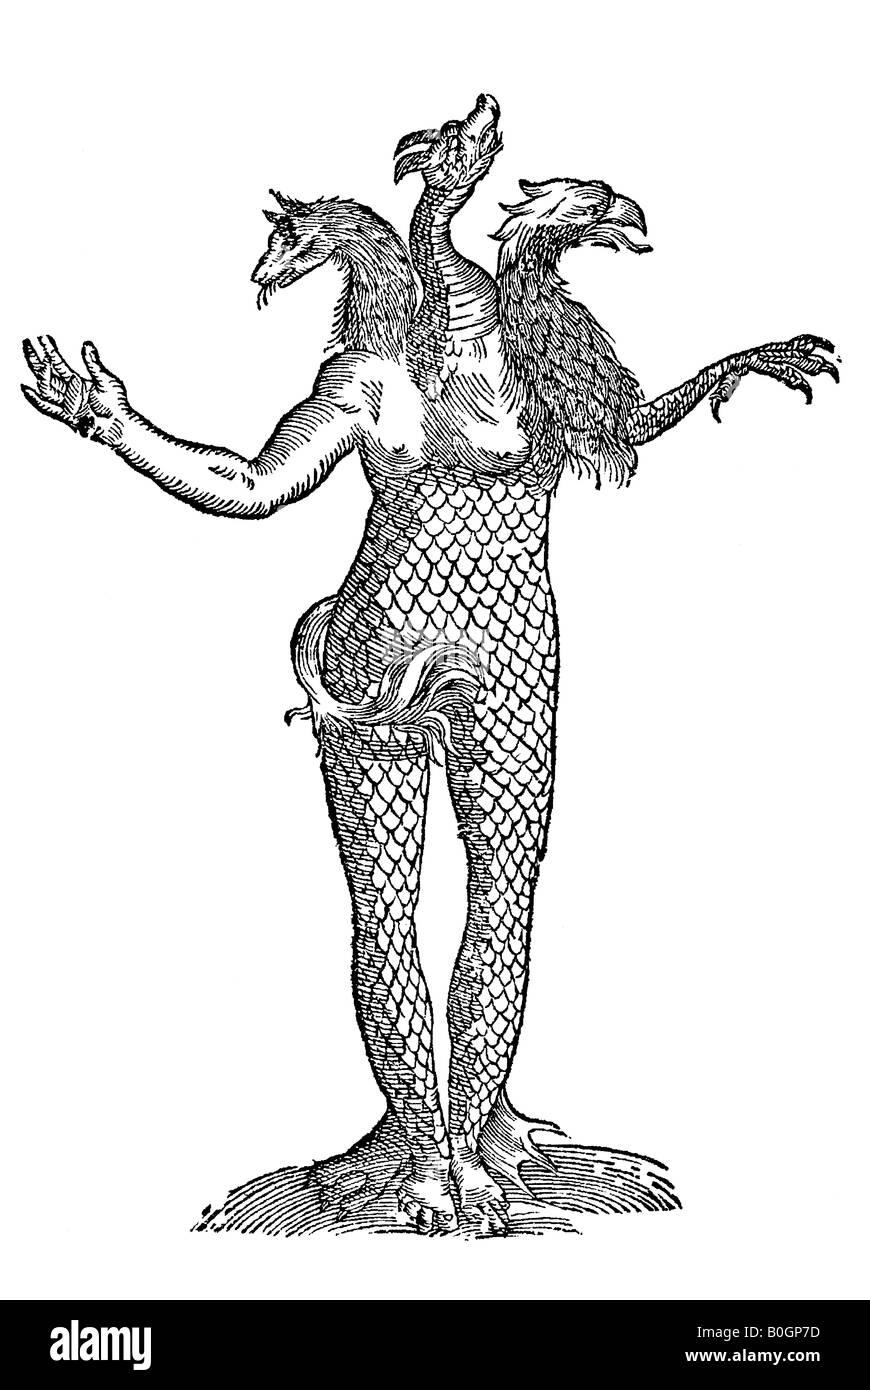 Monstrum tricipiti capite Draconis Vulpis & Aquilae, Aldrovandi, 1642, secolo XVII, Rinascimento, Europa Immagini Stock